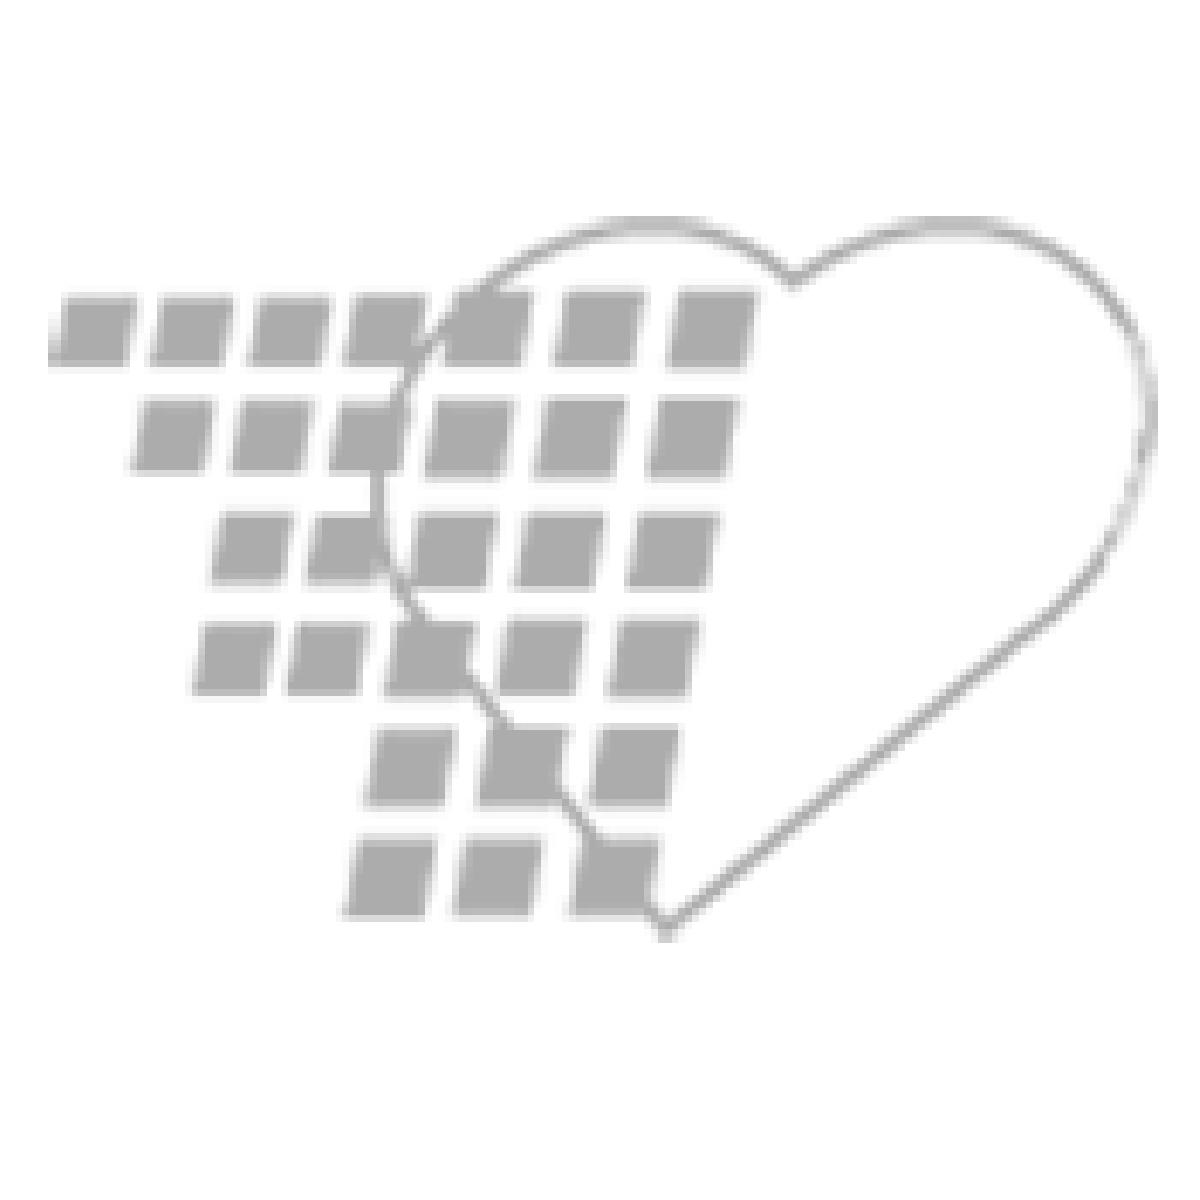 10-81-8623 Demo Dose® Inject-Ed XL